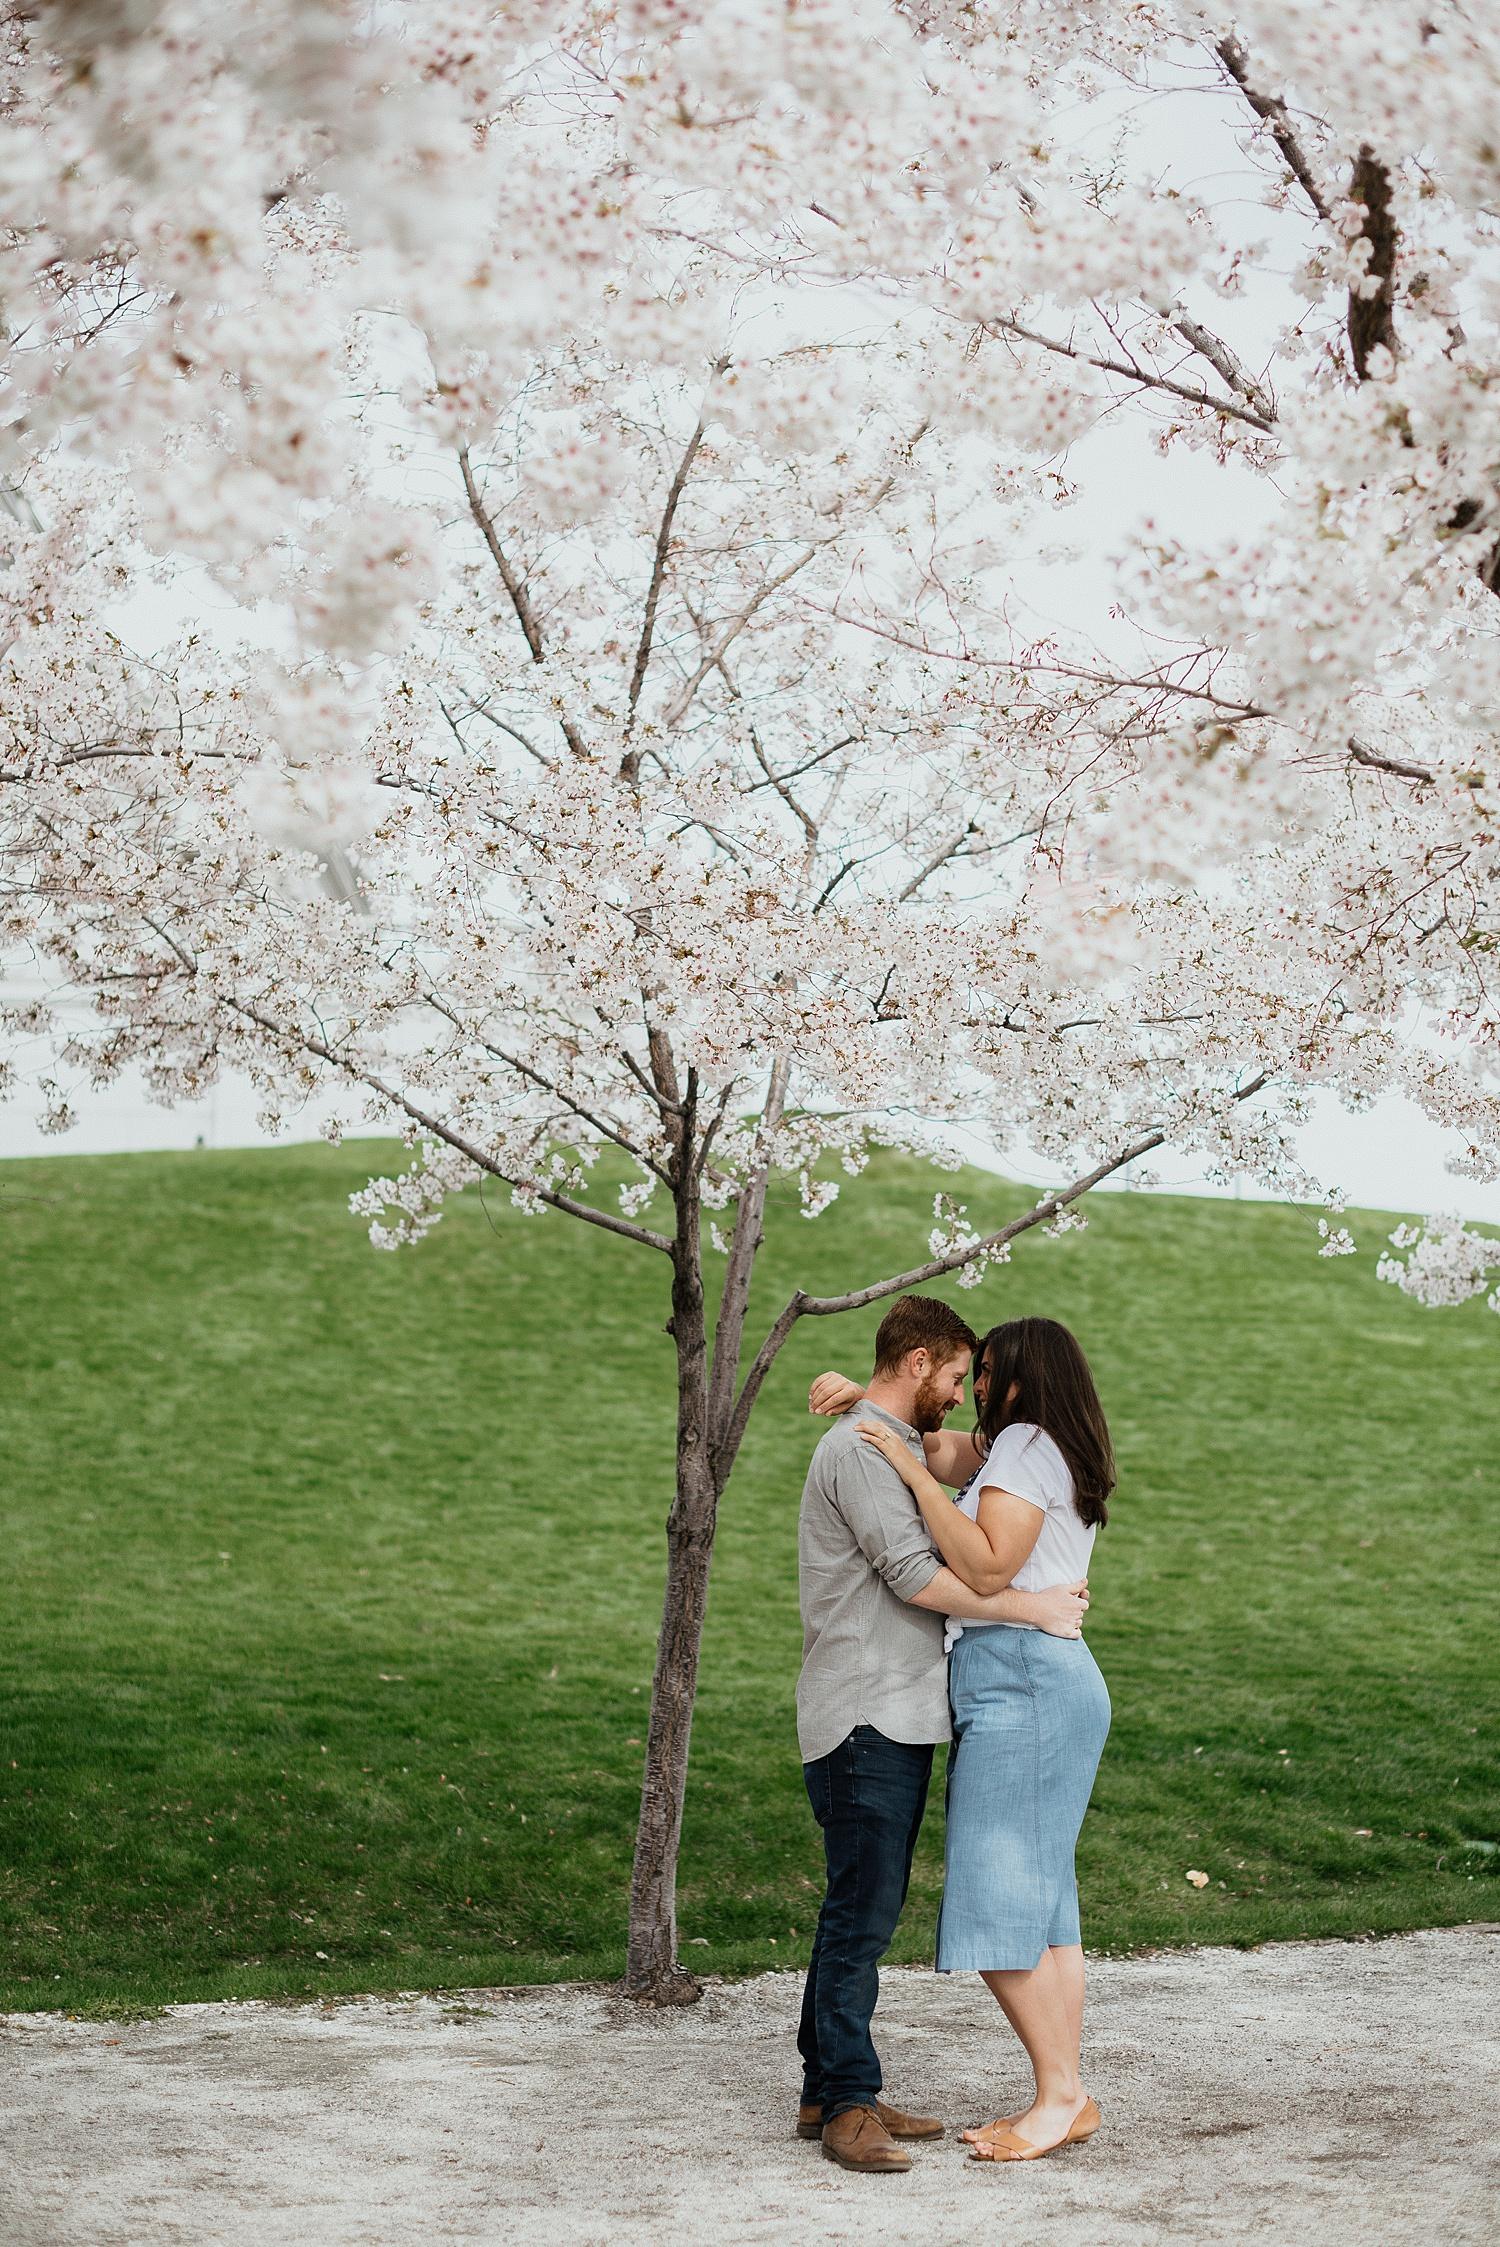 Zandra Barriga Photo - Steph and David Blossom Couples Session_0002.jpg